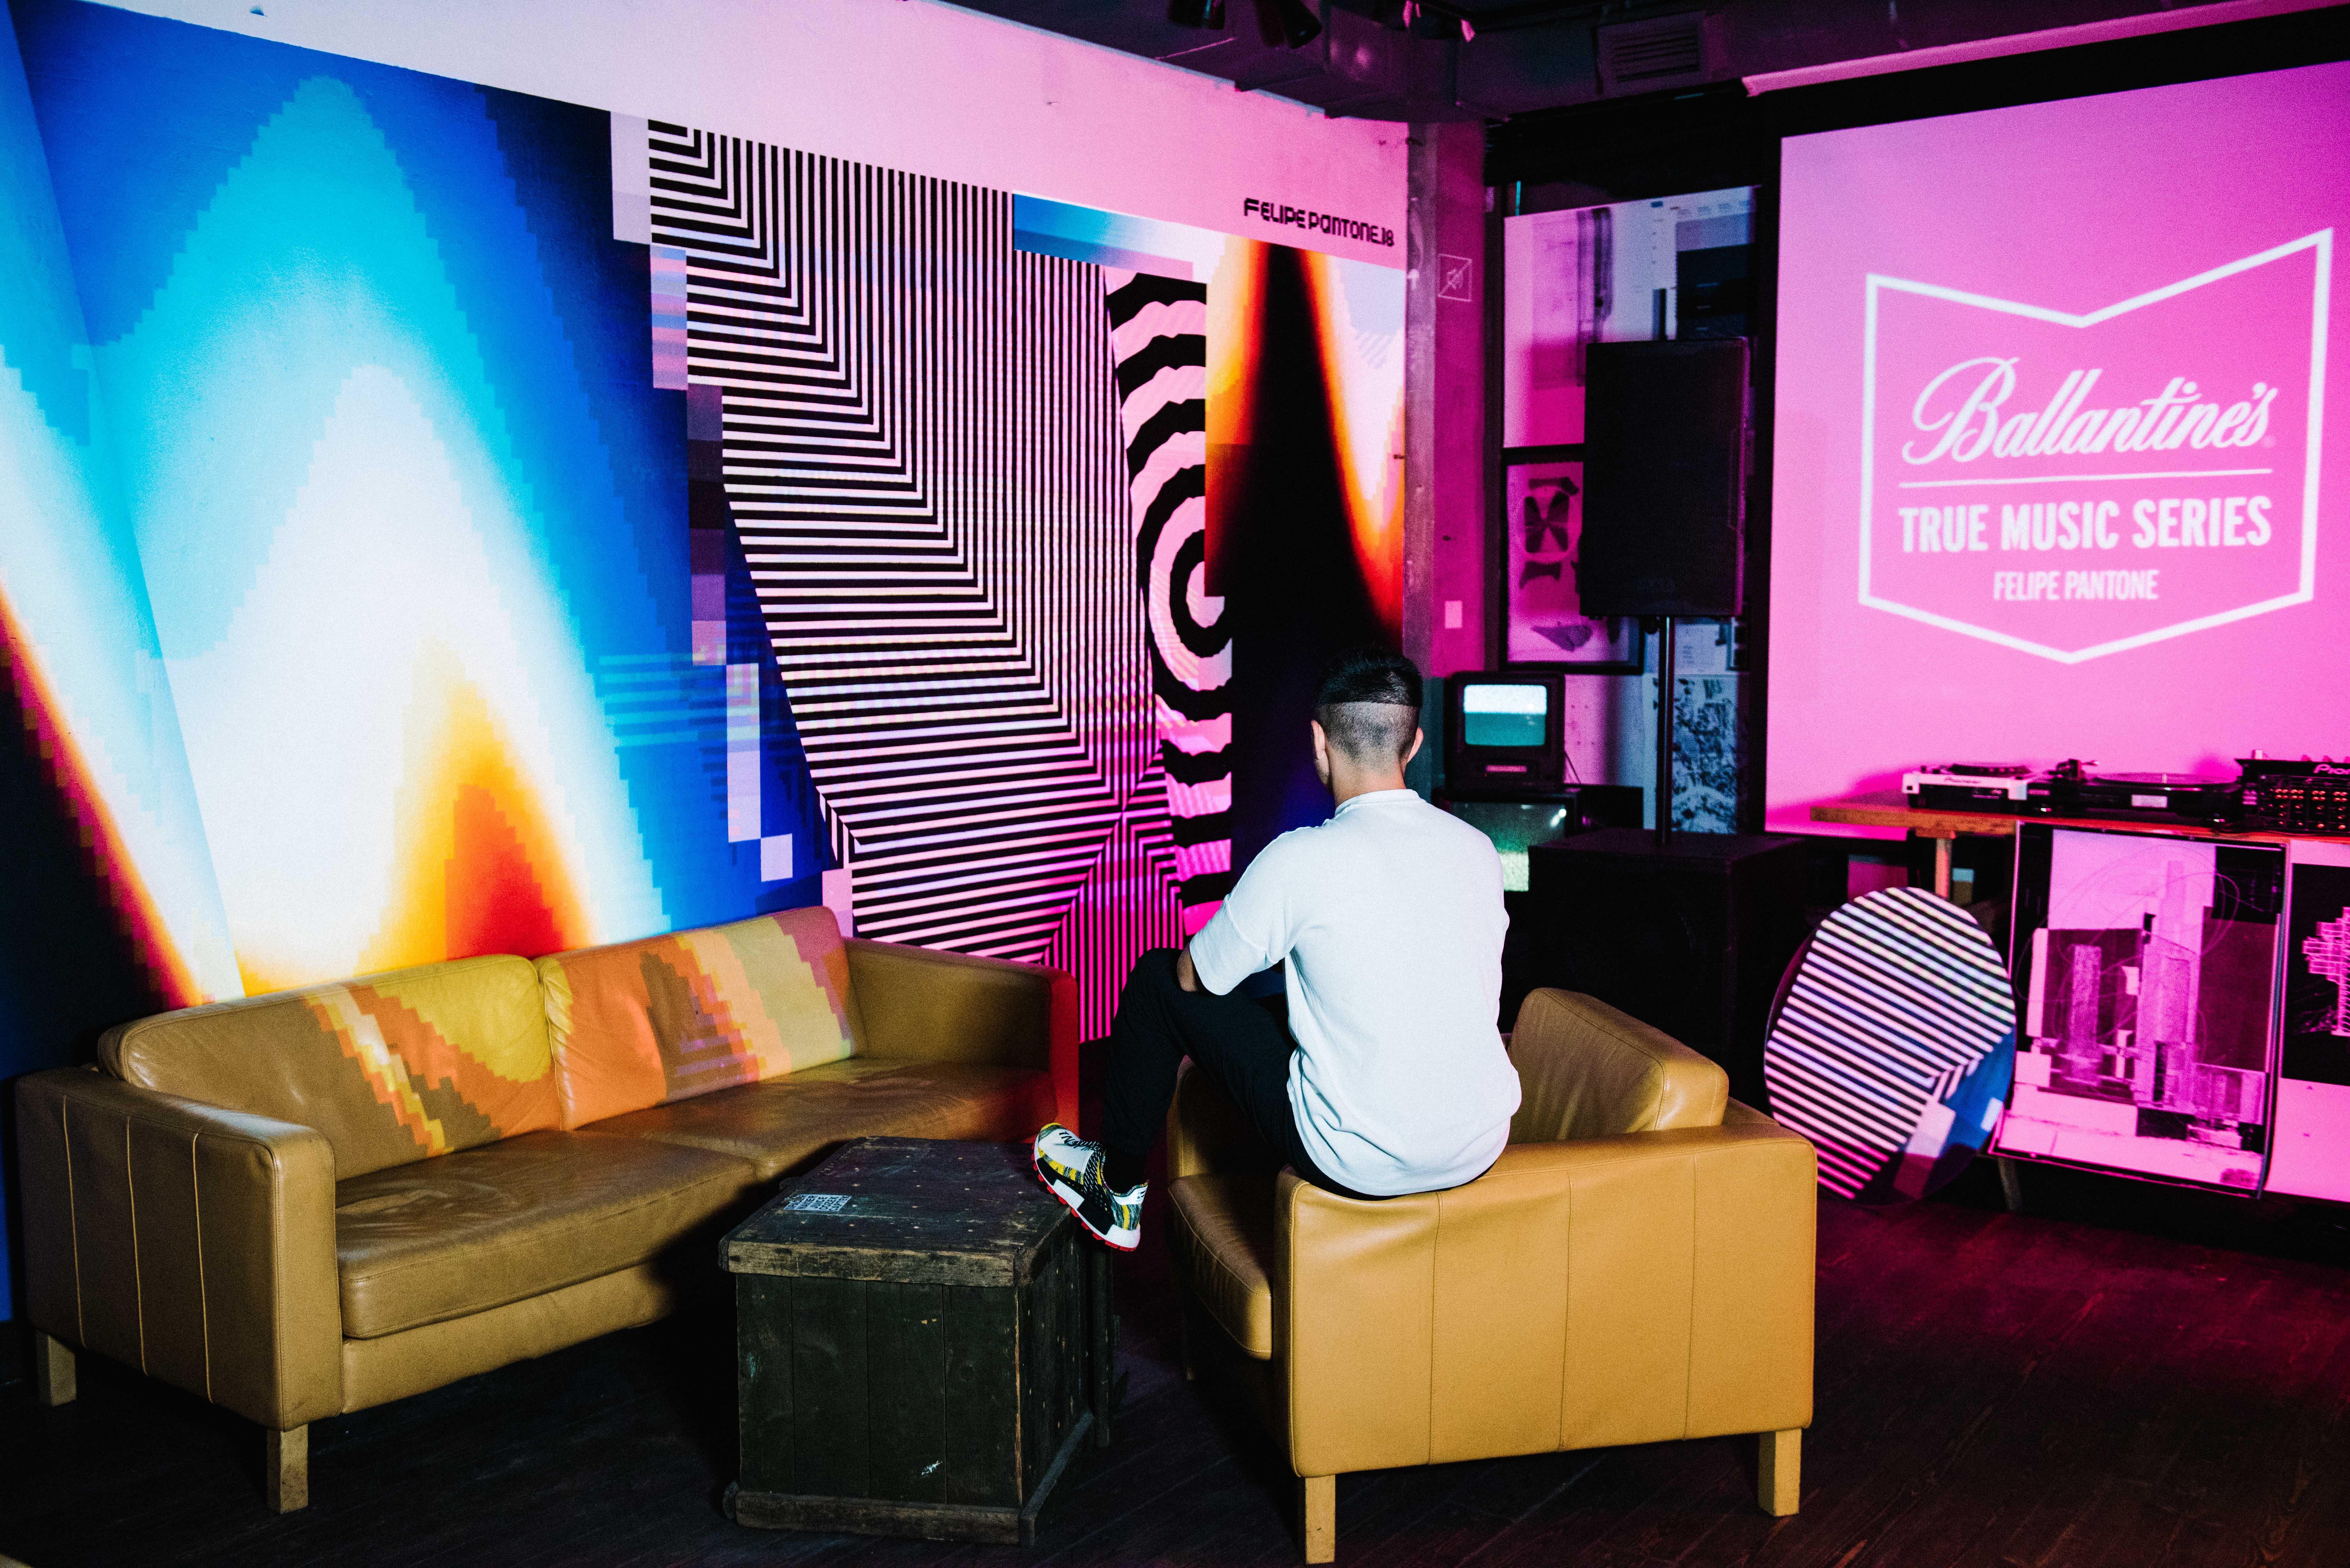 Ballantine's True Music Series X Felipe Pantone photo